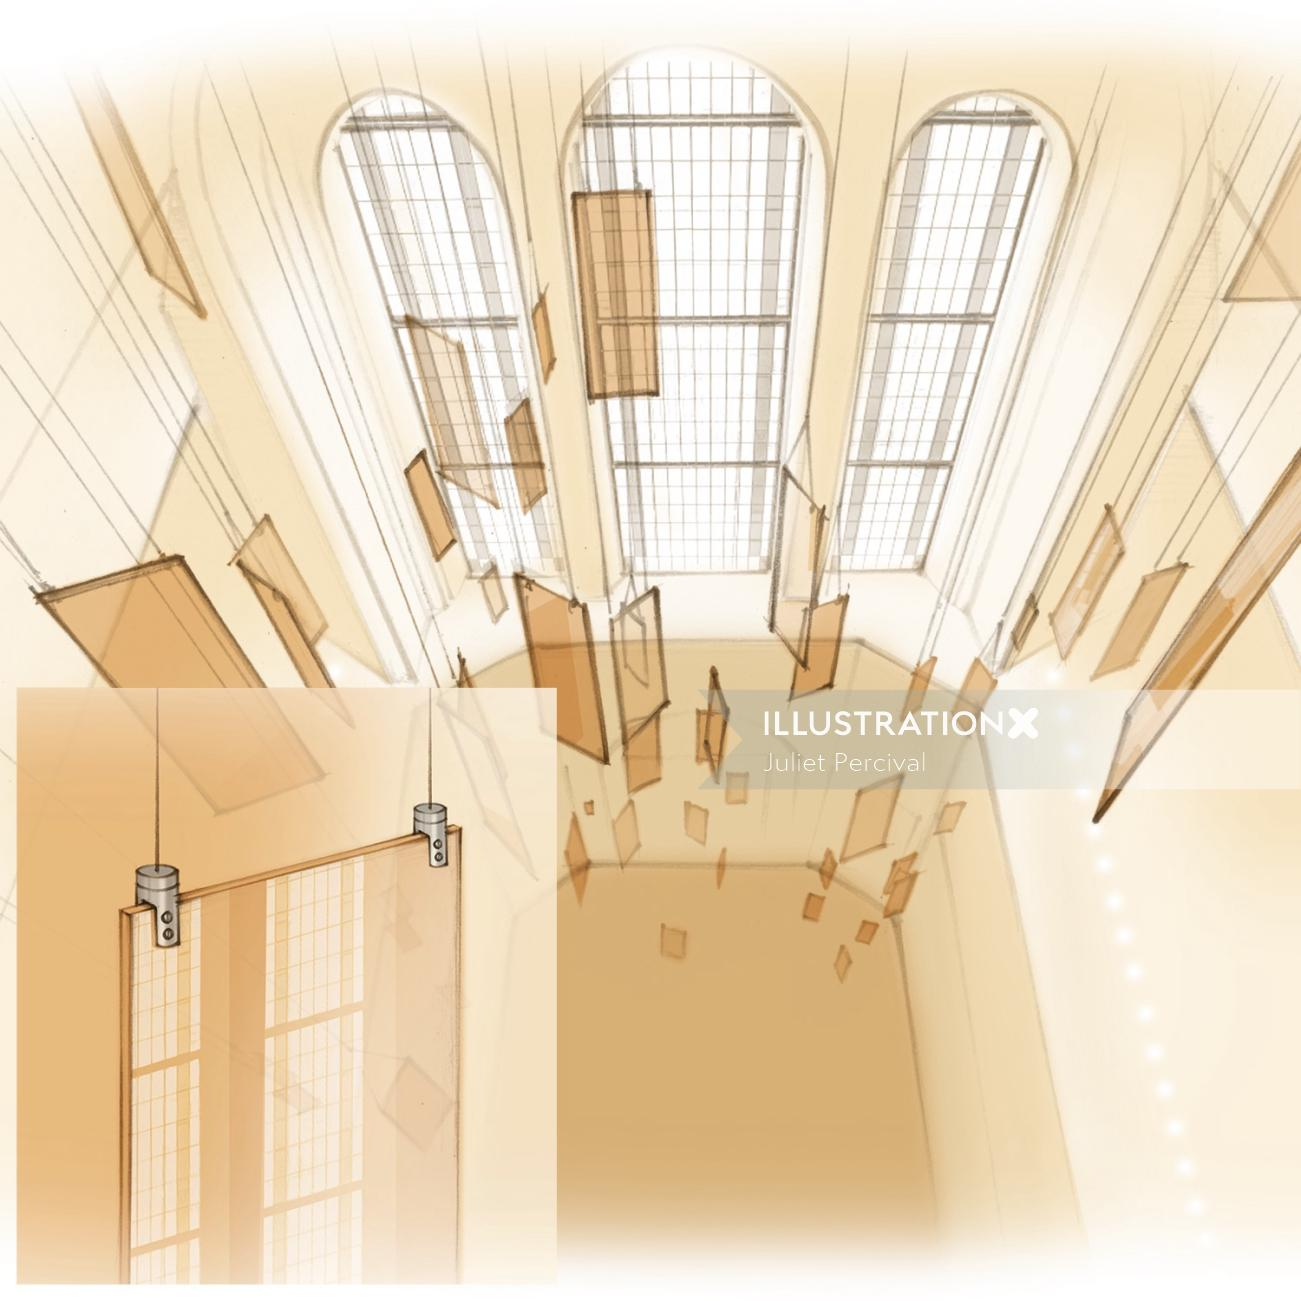 chandelier, perspex, lighting feature, hanging installation, interior design